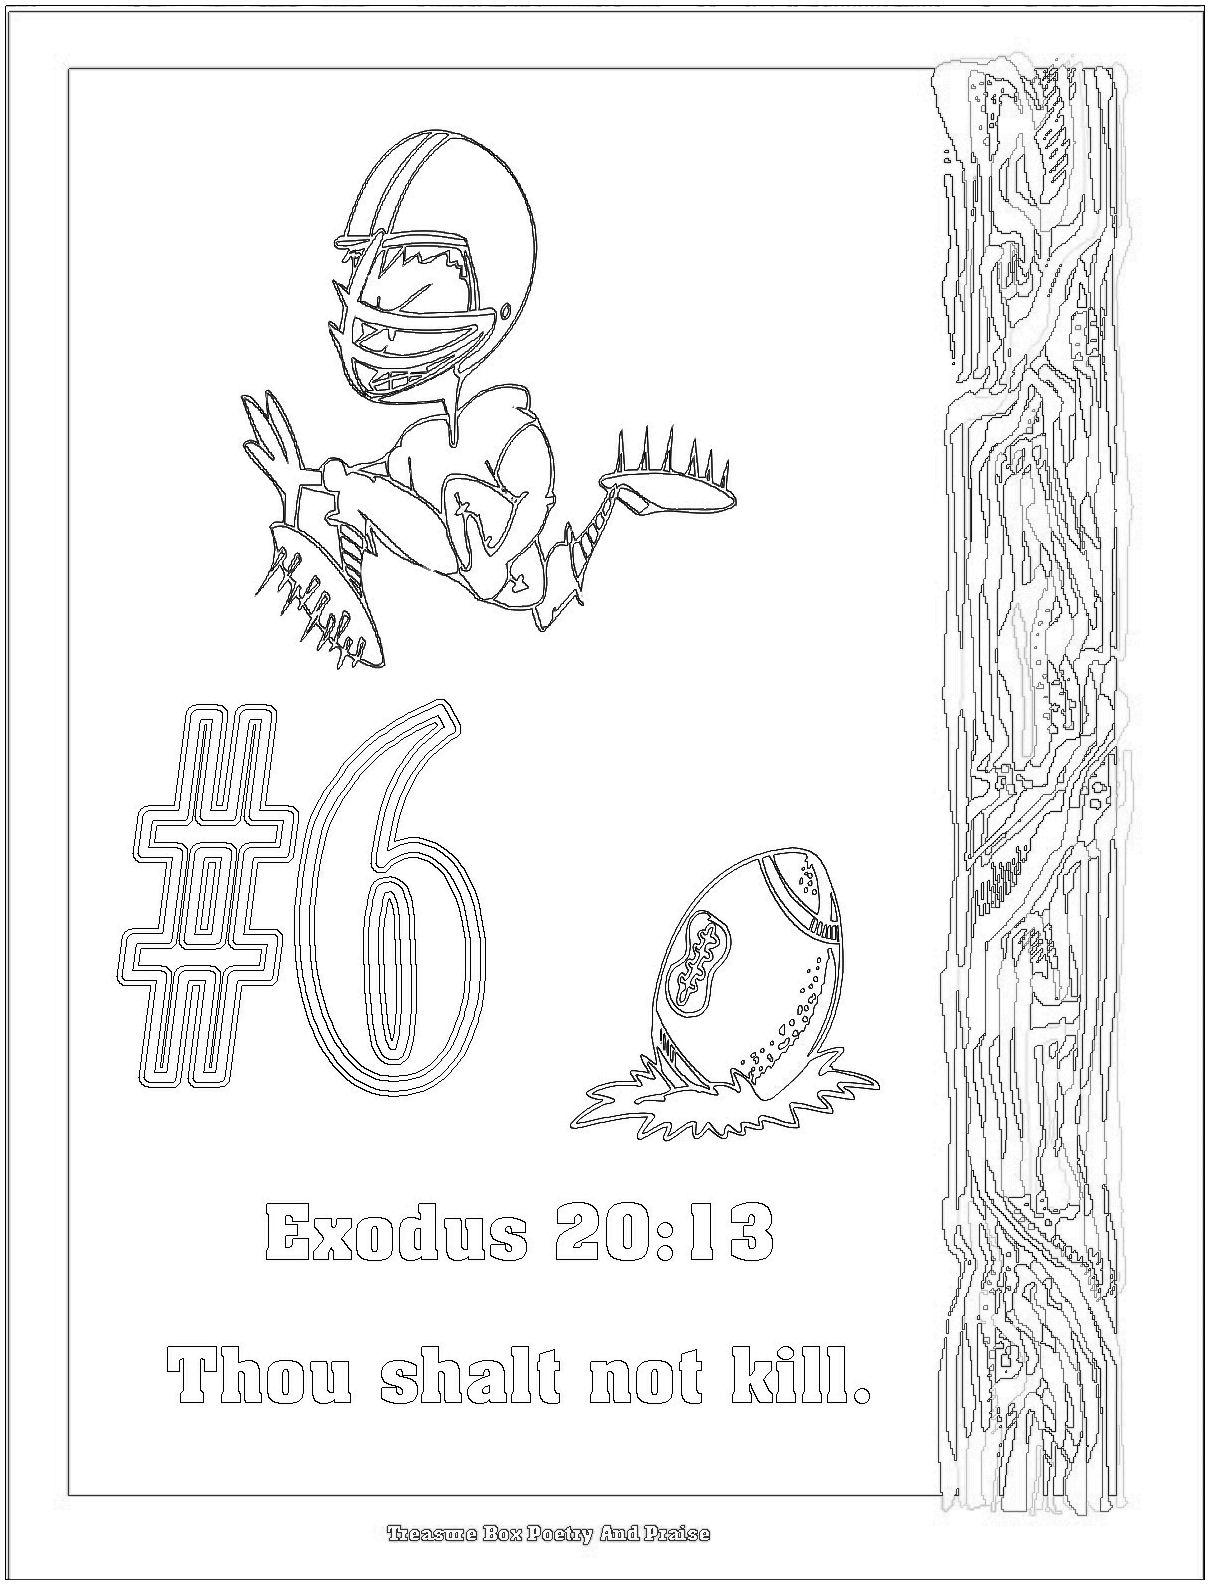 10 Commandments Coloring Pages...